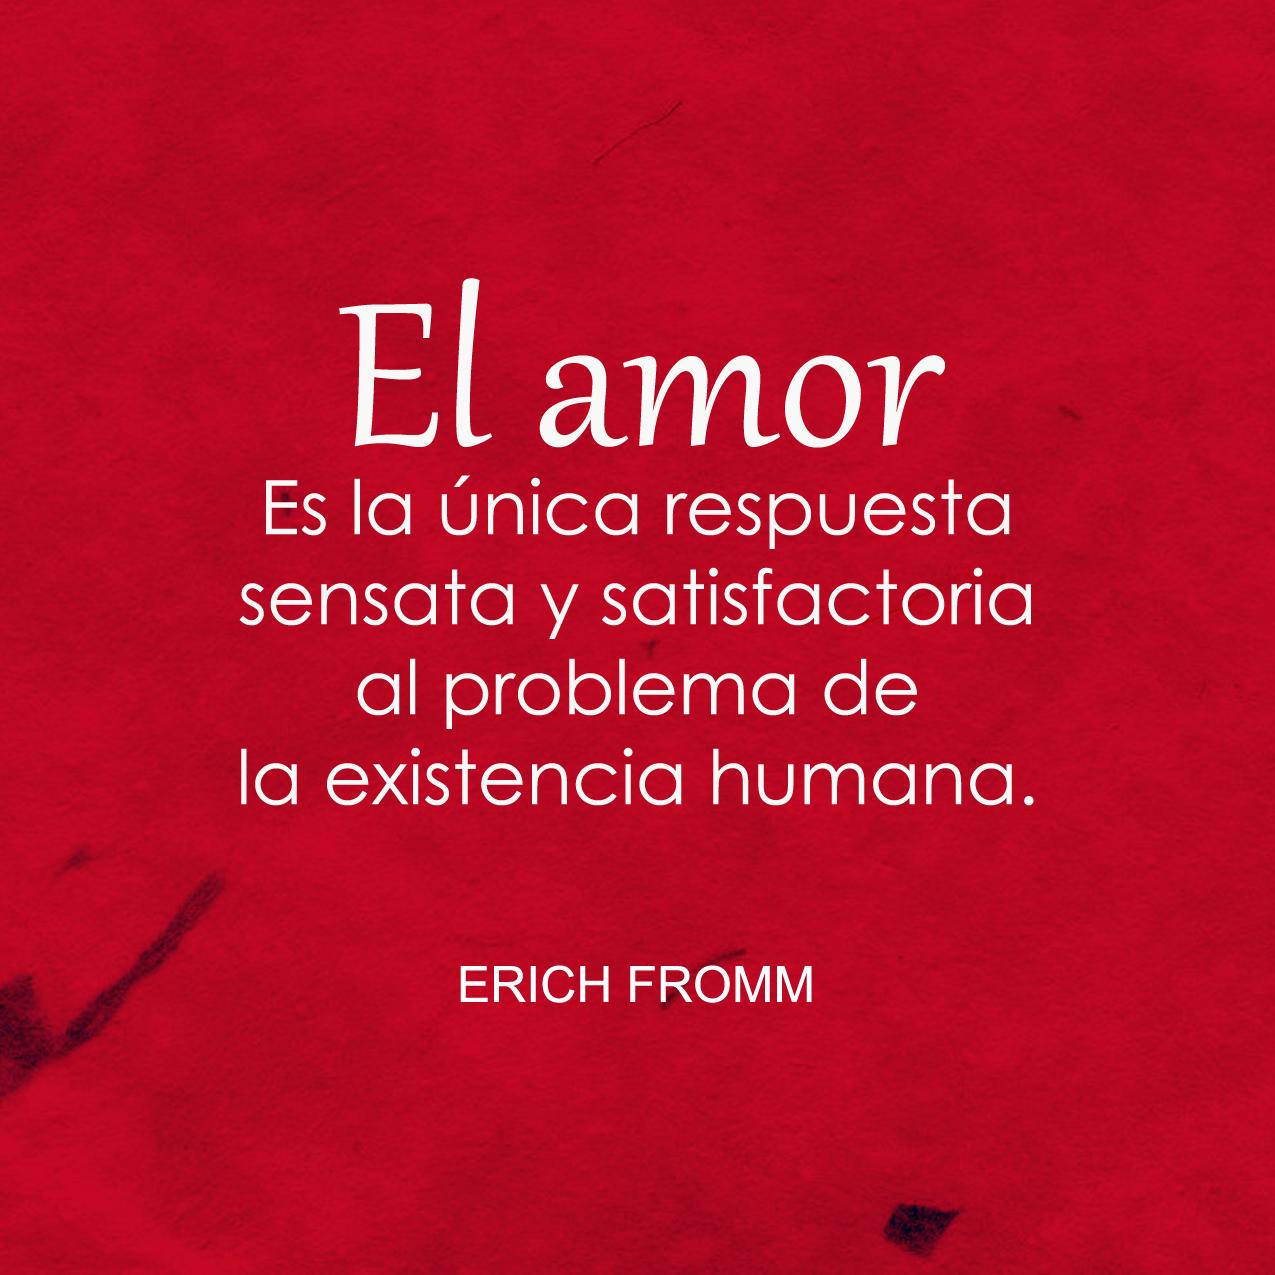 Erich Fromm Palabras De Reflexion Frases De Identidad Frases